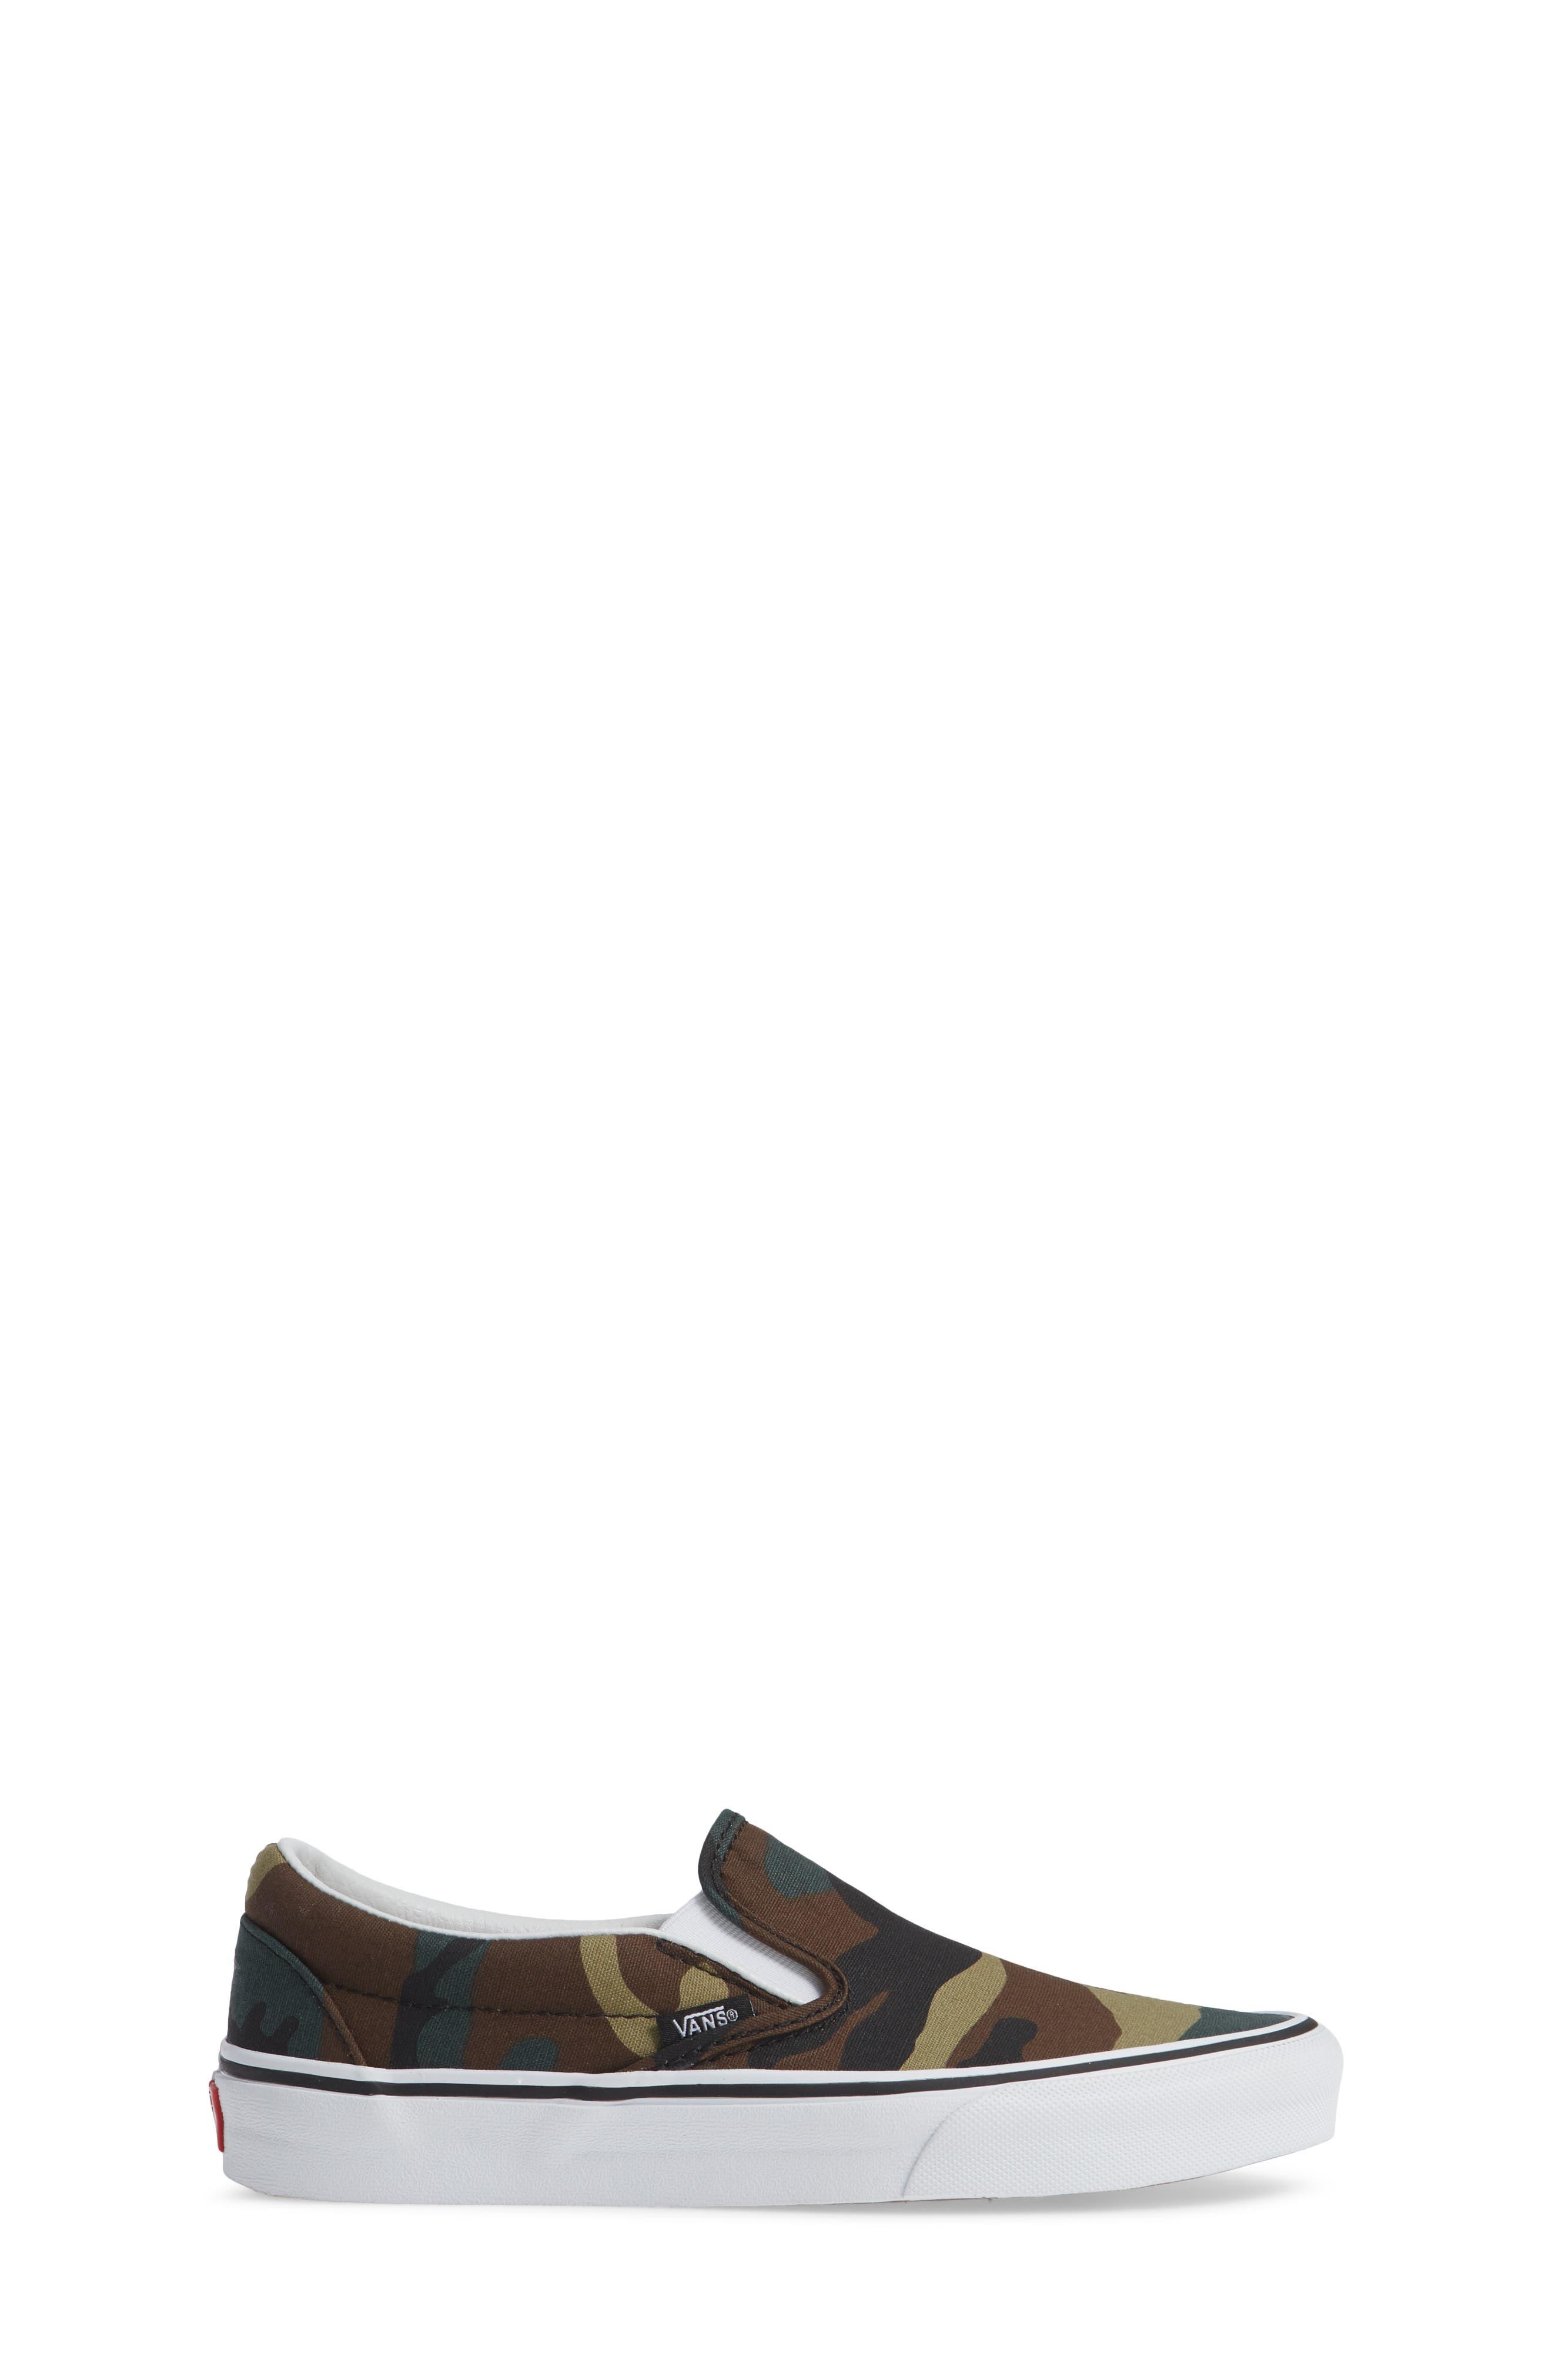 Classic Slip-On Sneaker,                             Alternate thumbnail 3, color,                             Black / Woodland